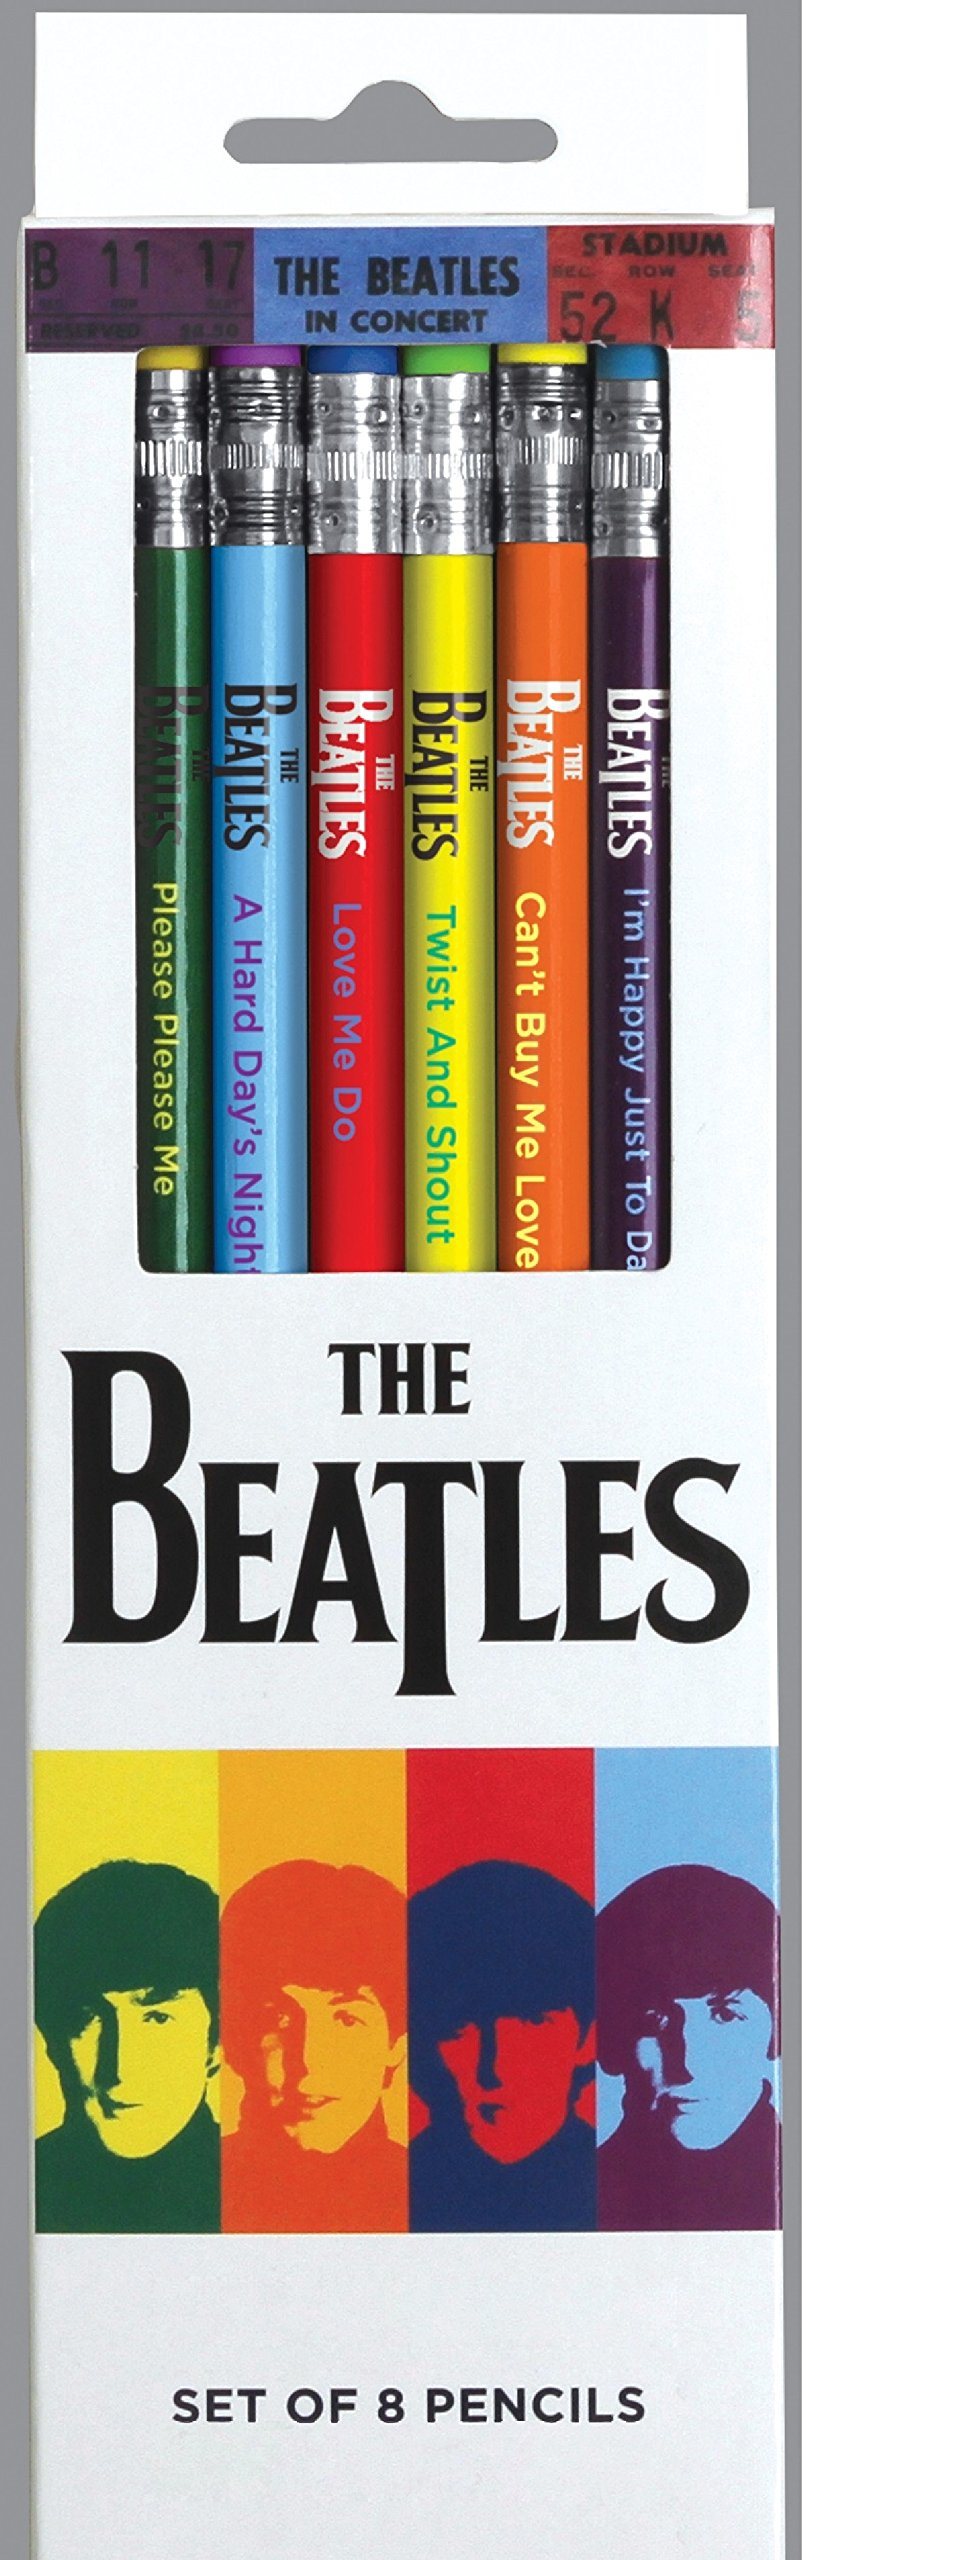 The Beatles 1964 Collection: Amazon.es: Galison: Libros en idiomas extranjeros